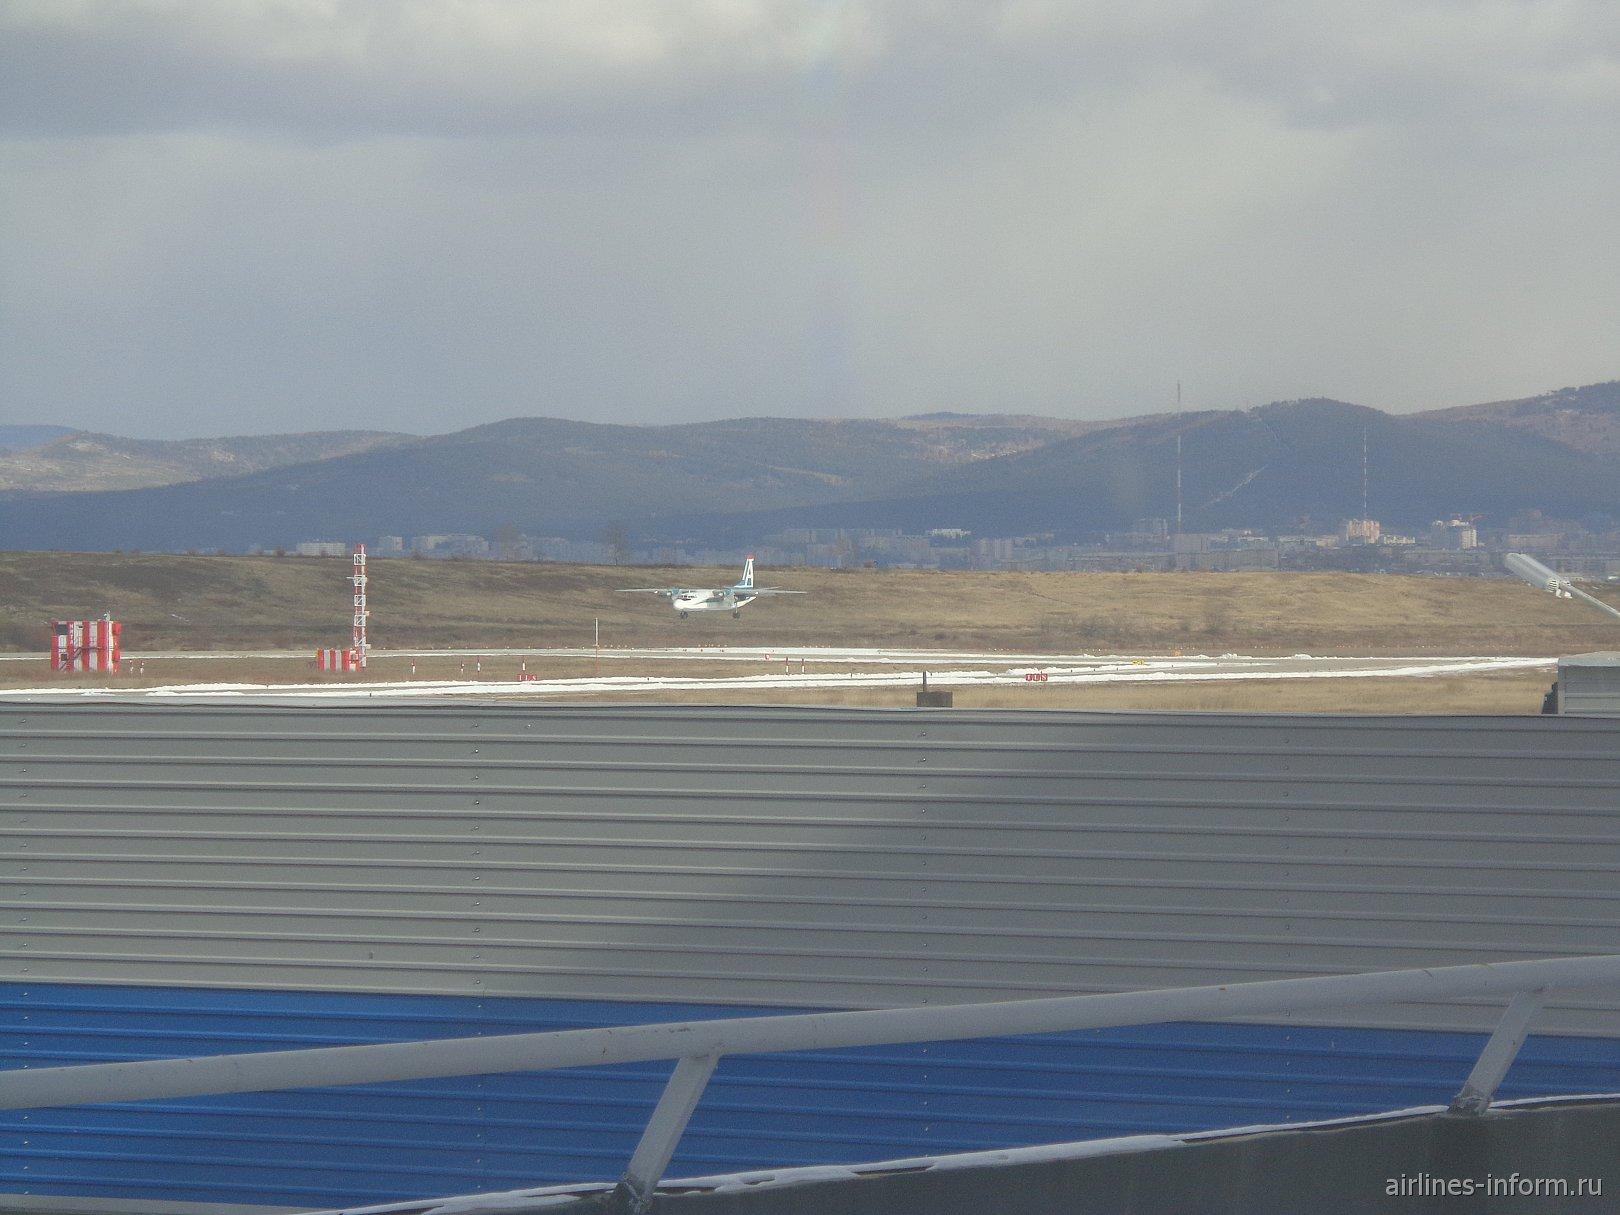 АН-24 авиакомпании Ангара над ВПП аэропорта Кадала, города Чита